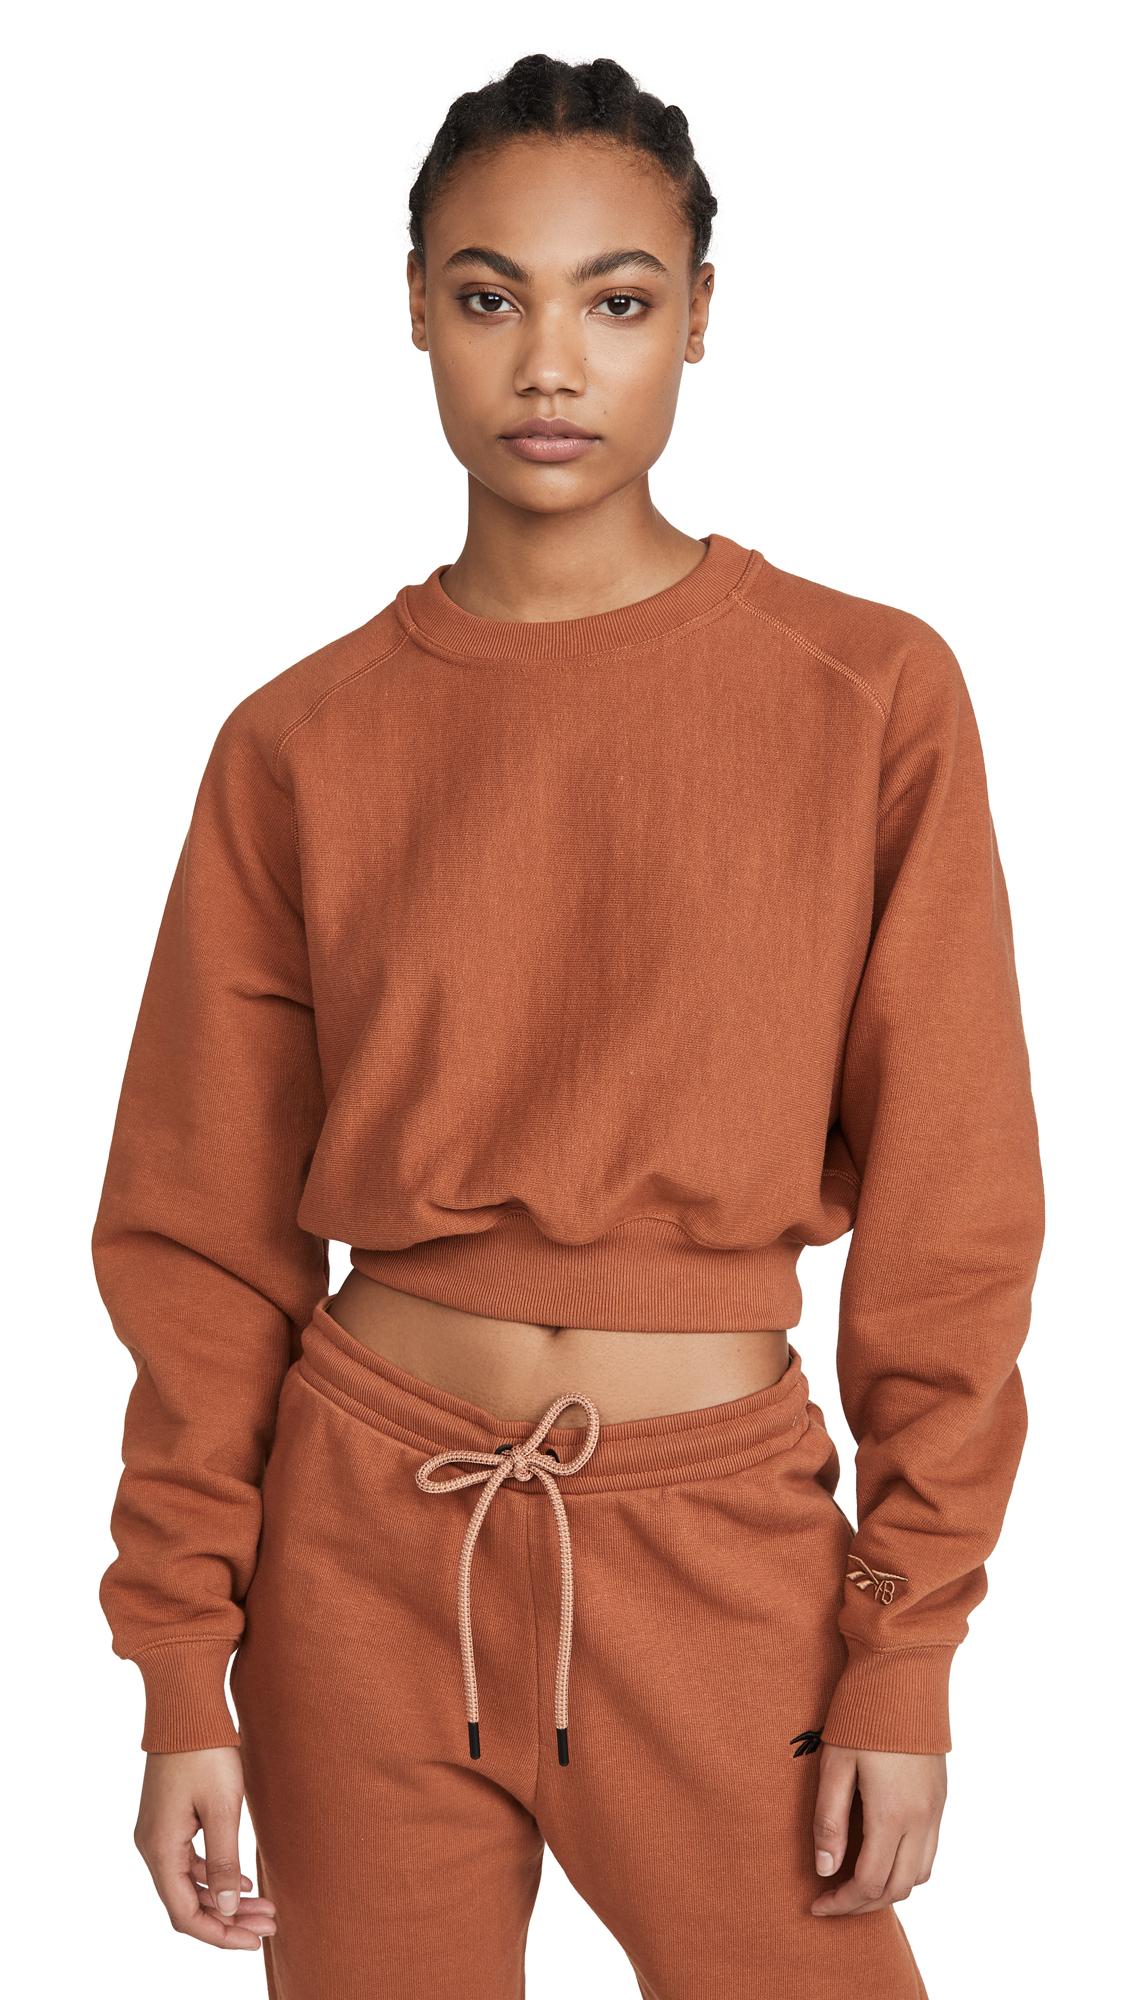 Reebok x Victoria Beckham RBK VB Sweatshirt – 30% Off Sale